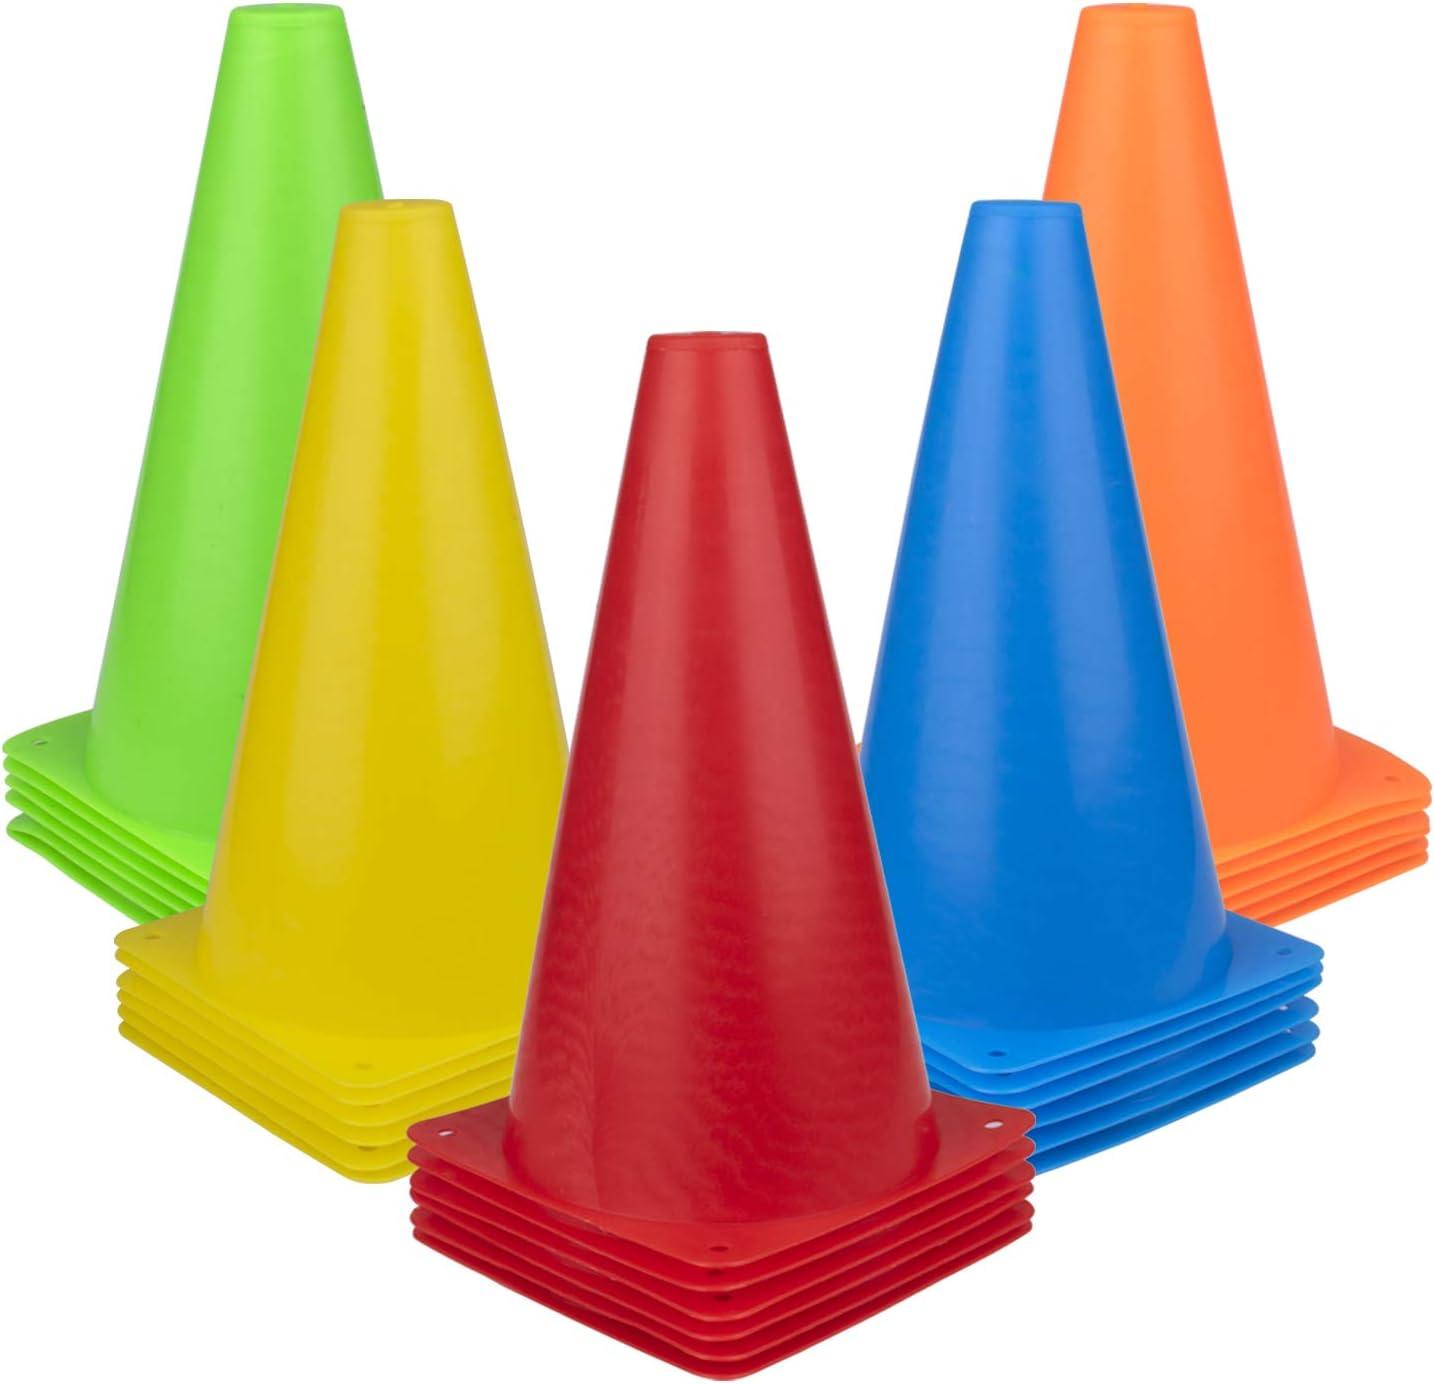 Fasmov Regular discount 30 PCS Training Cones Sport Plastic We OFFer at cheap prices Cone Traffic